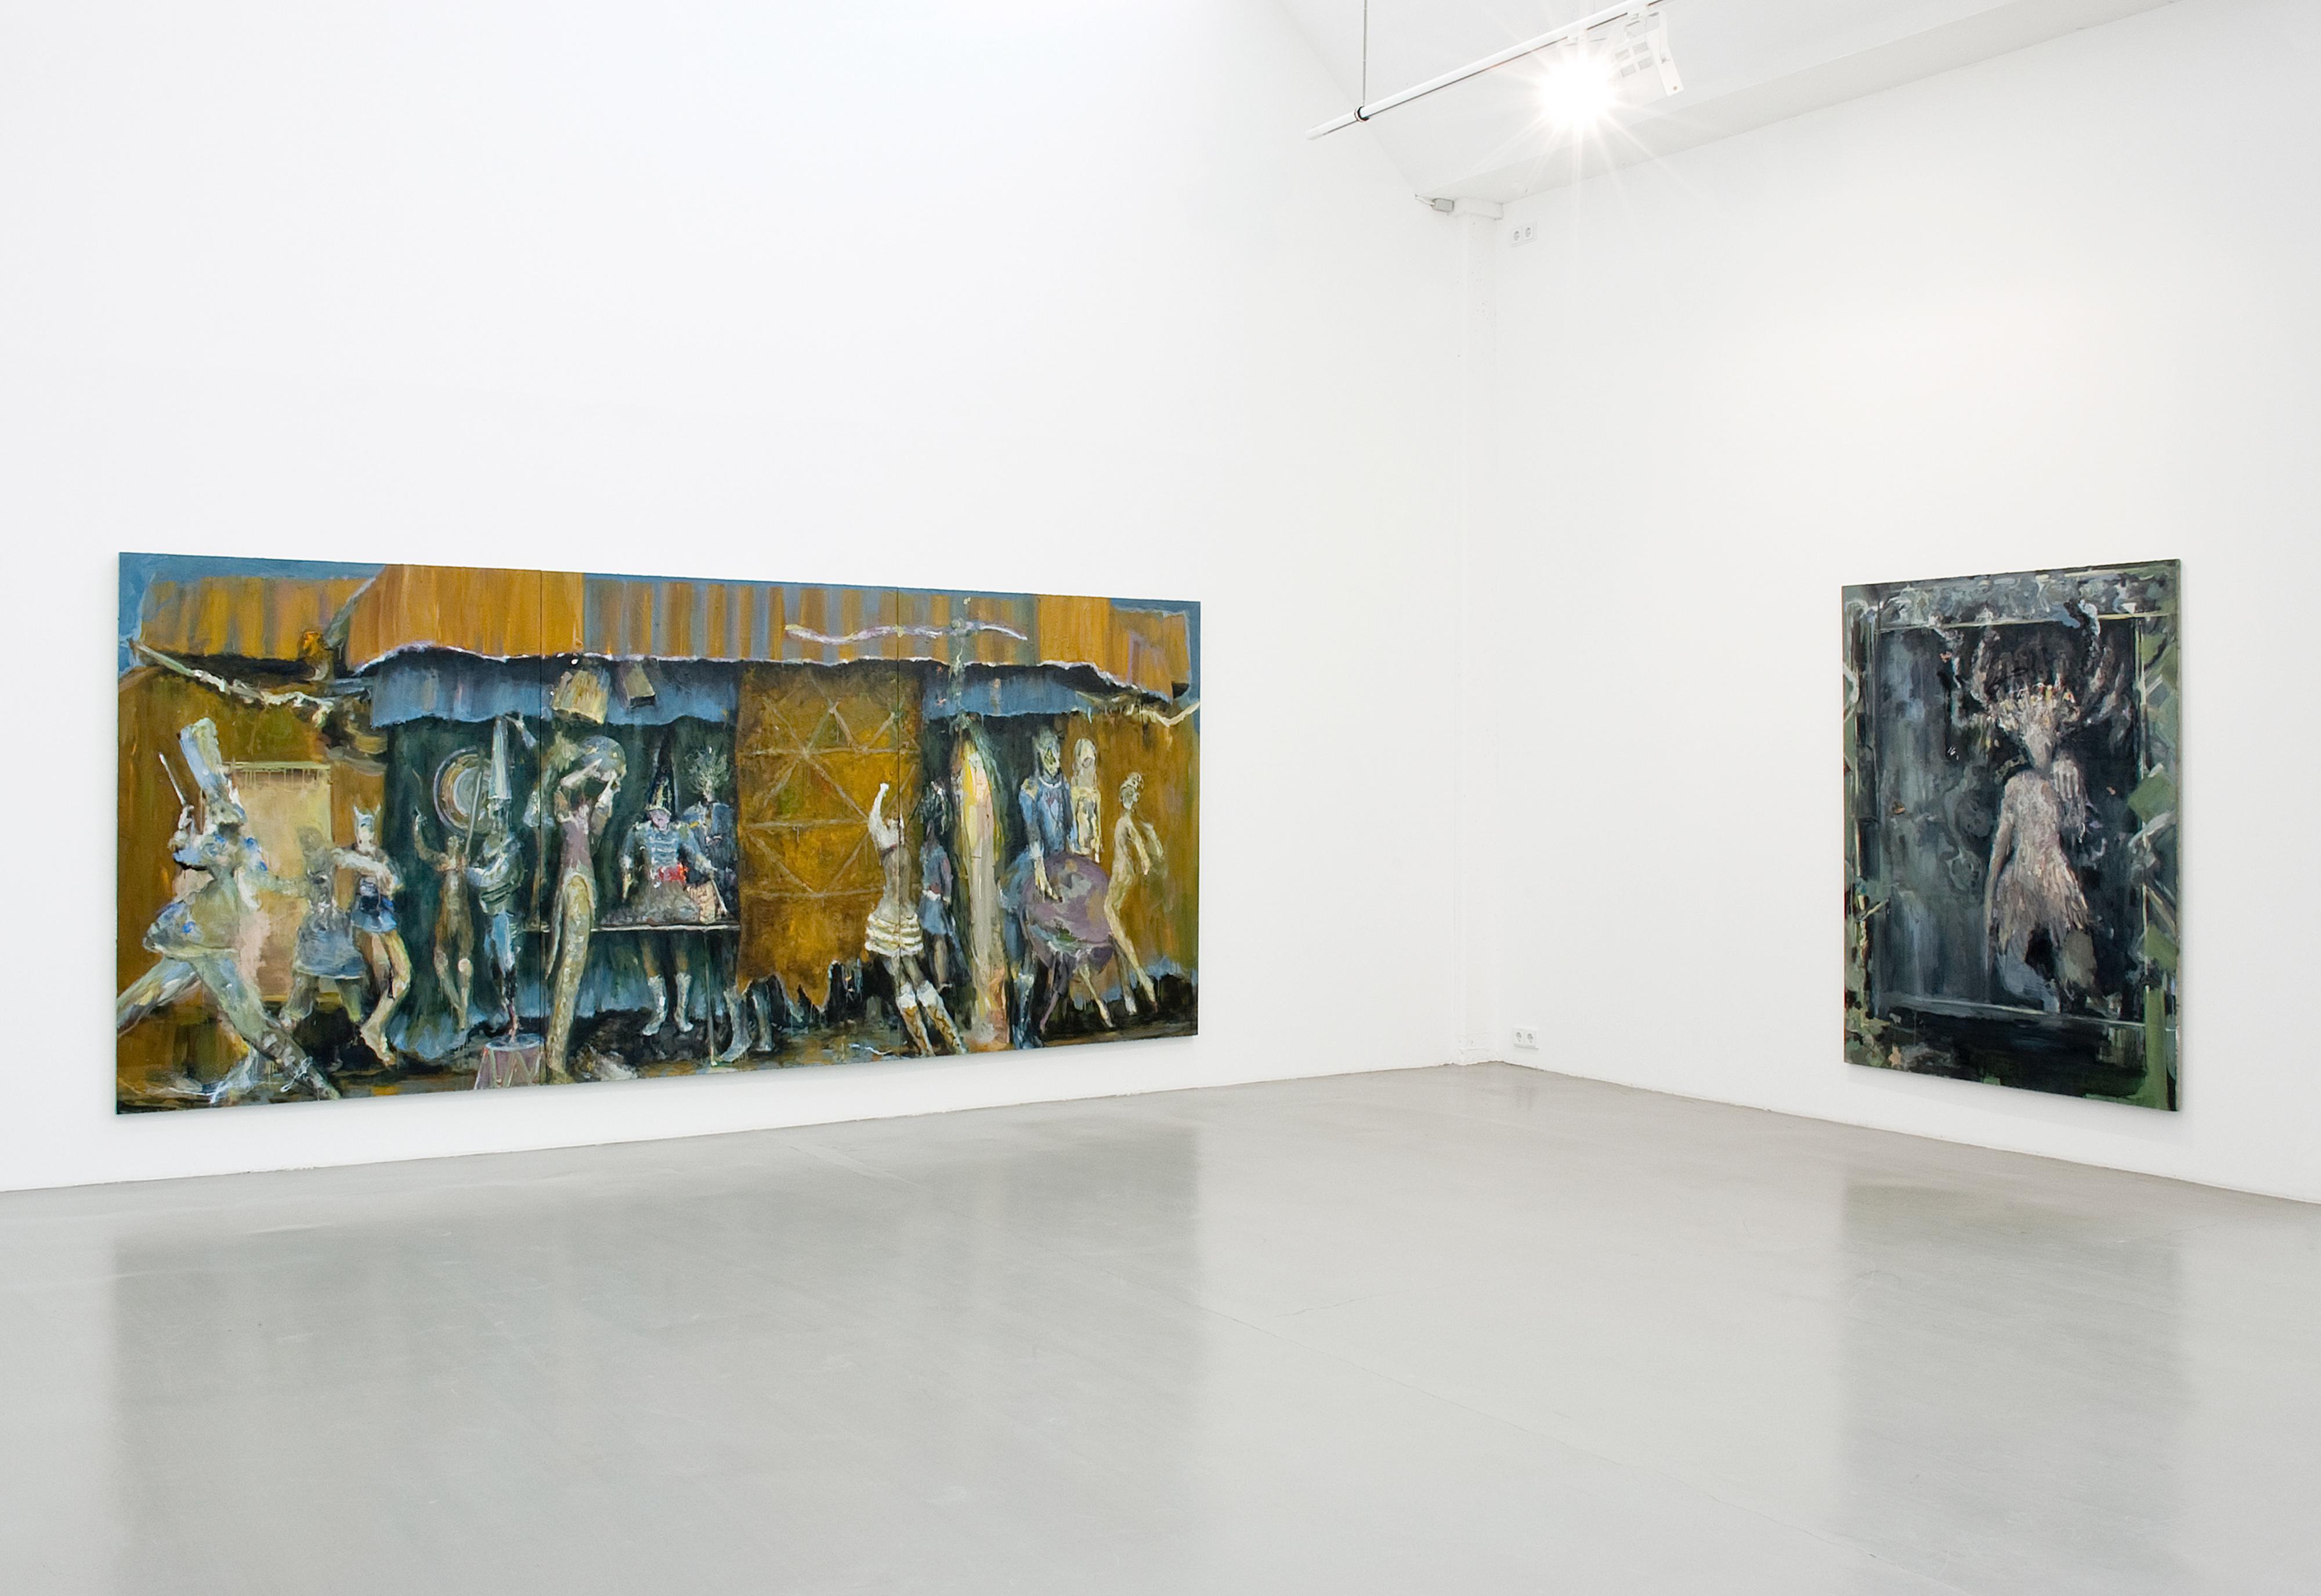 Galerie Barbara Thumm \ Valérie Favre – The Art of Watching Birds